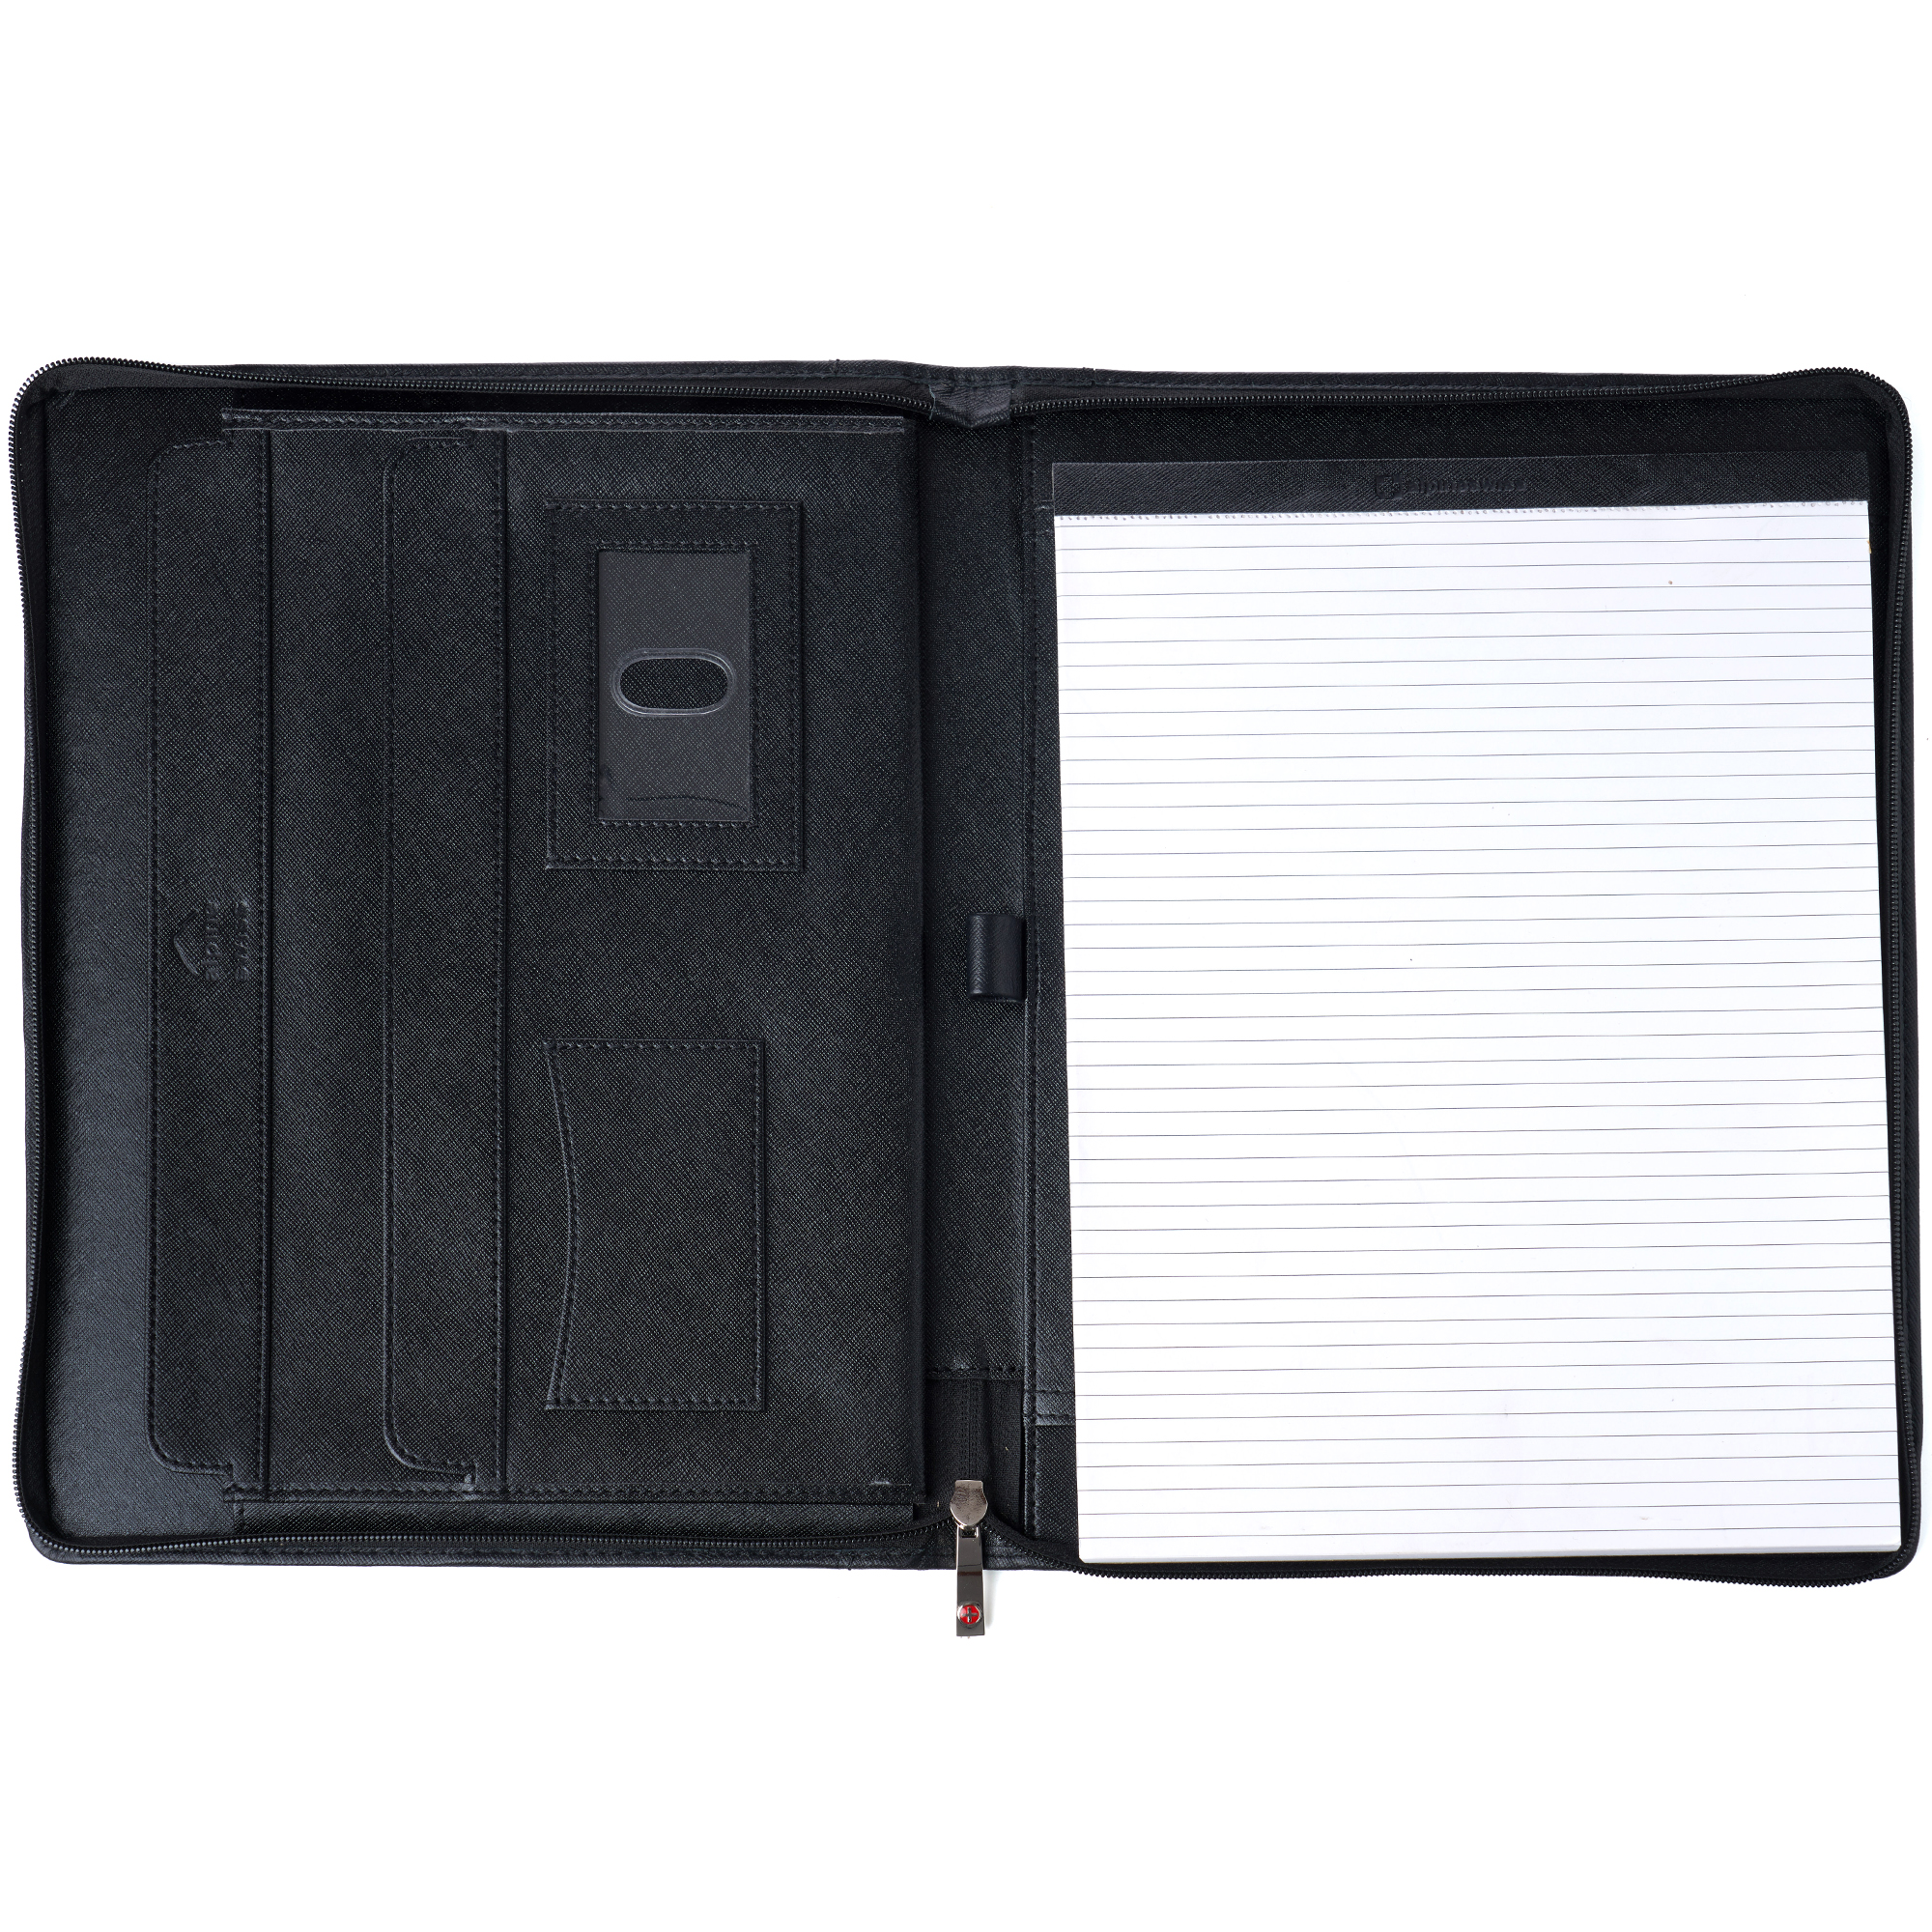 thumbnail 23 - Alpine Swiss Leather Zippered Writing Pad Portfolio Business Briefcase Organizer